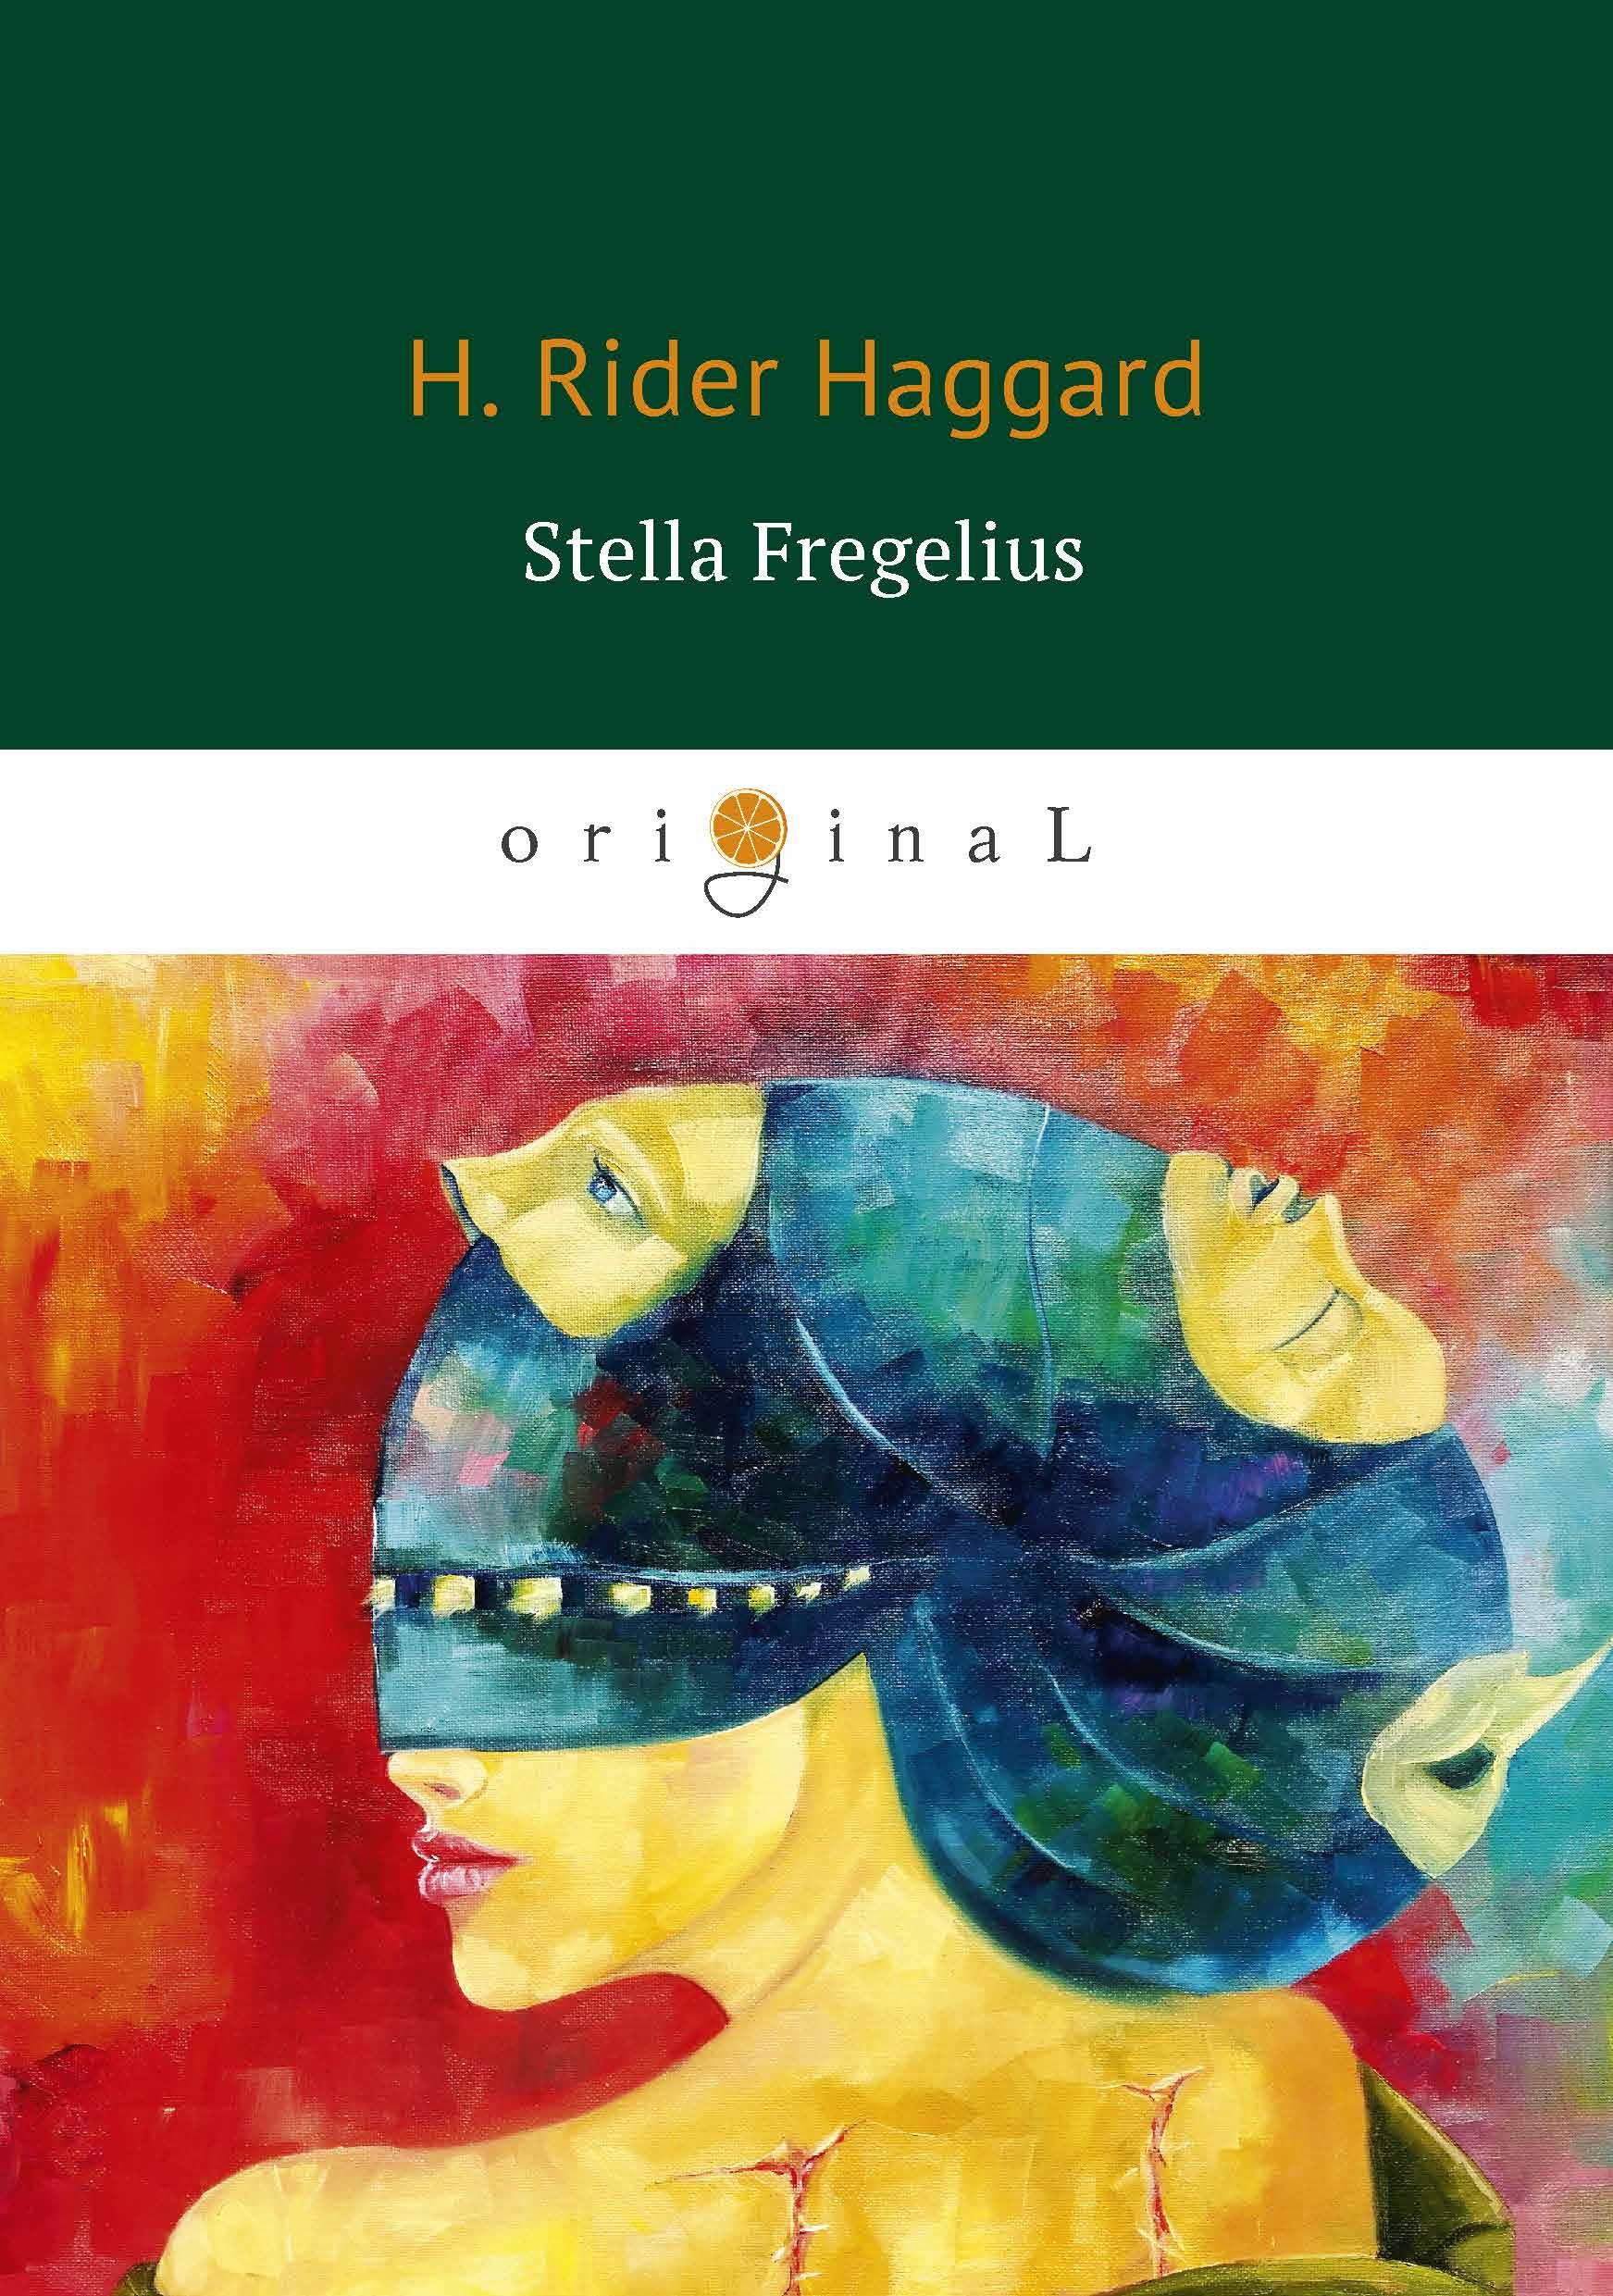 H. Rider Haggard Stella Fregelius (Стелла Фрегелиус: история трёх судеб) cervical cancer in amhara region in ethiopia